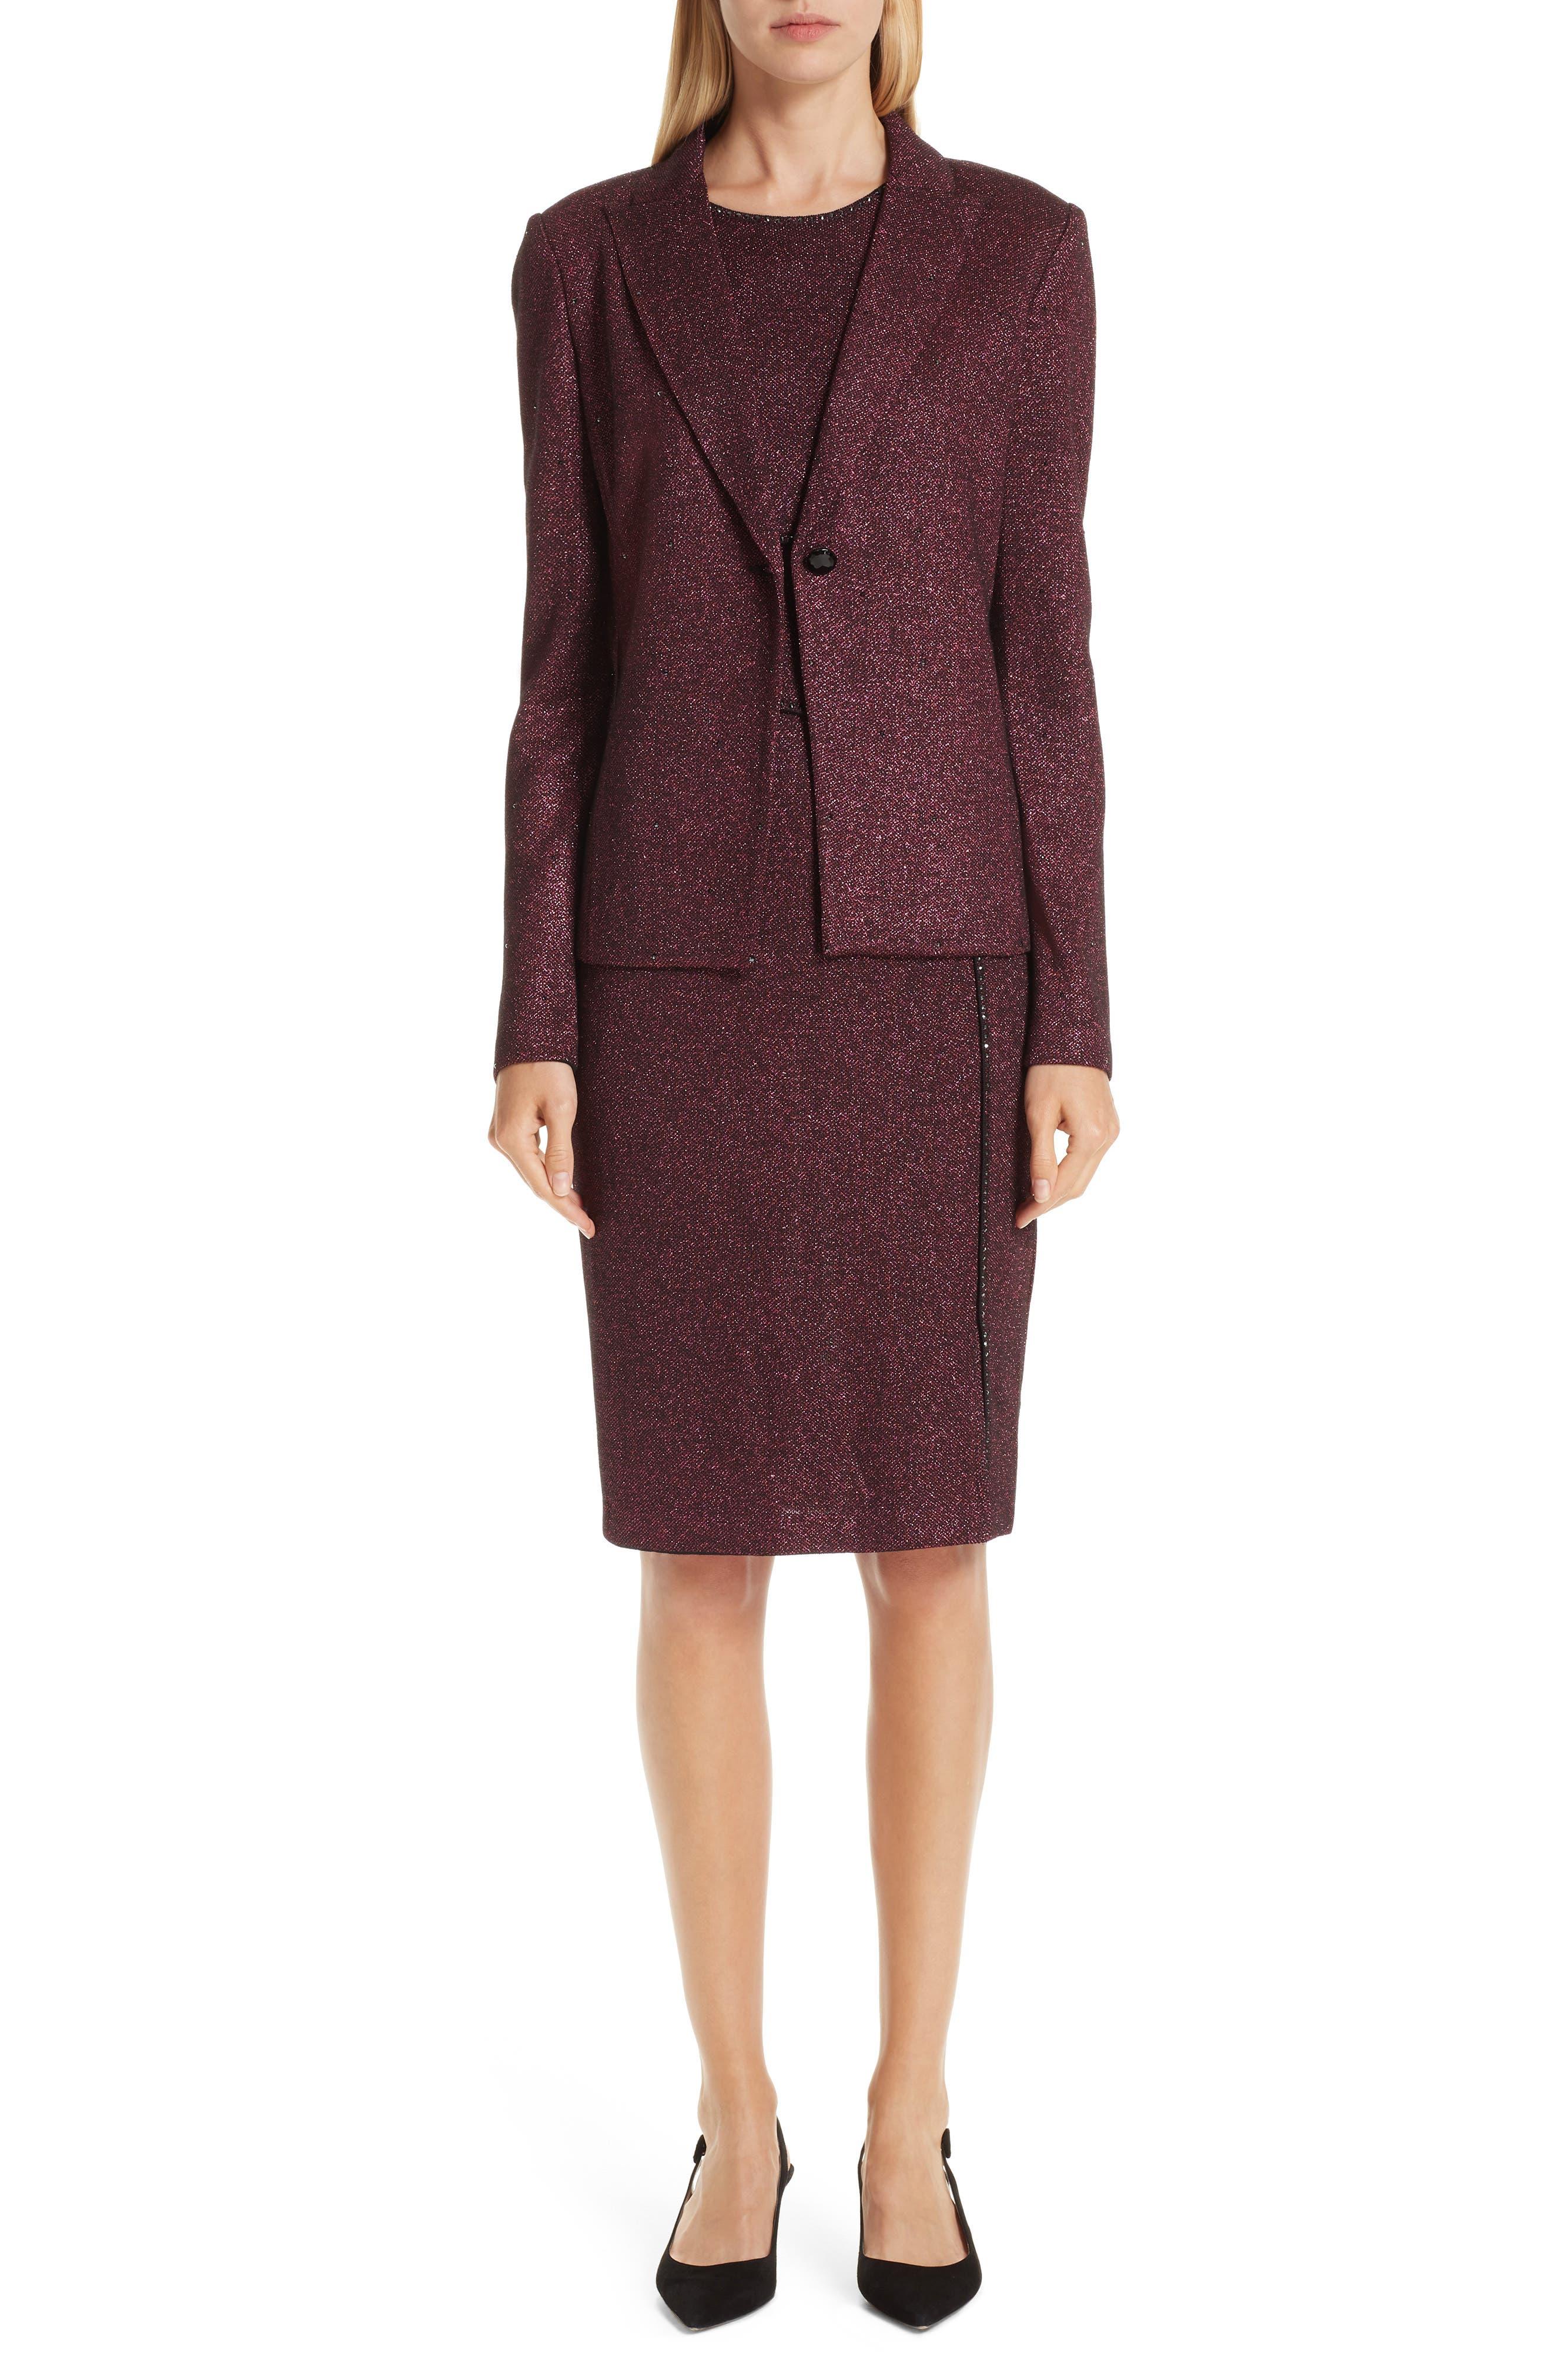 Mod Metallic Knit Sheath Dress,                             Alternate thumbnail 8, color,                             DARK PINK MULTI